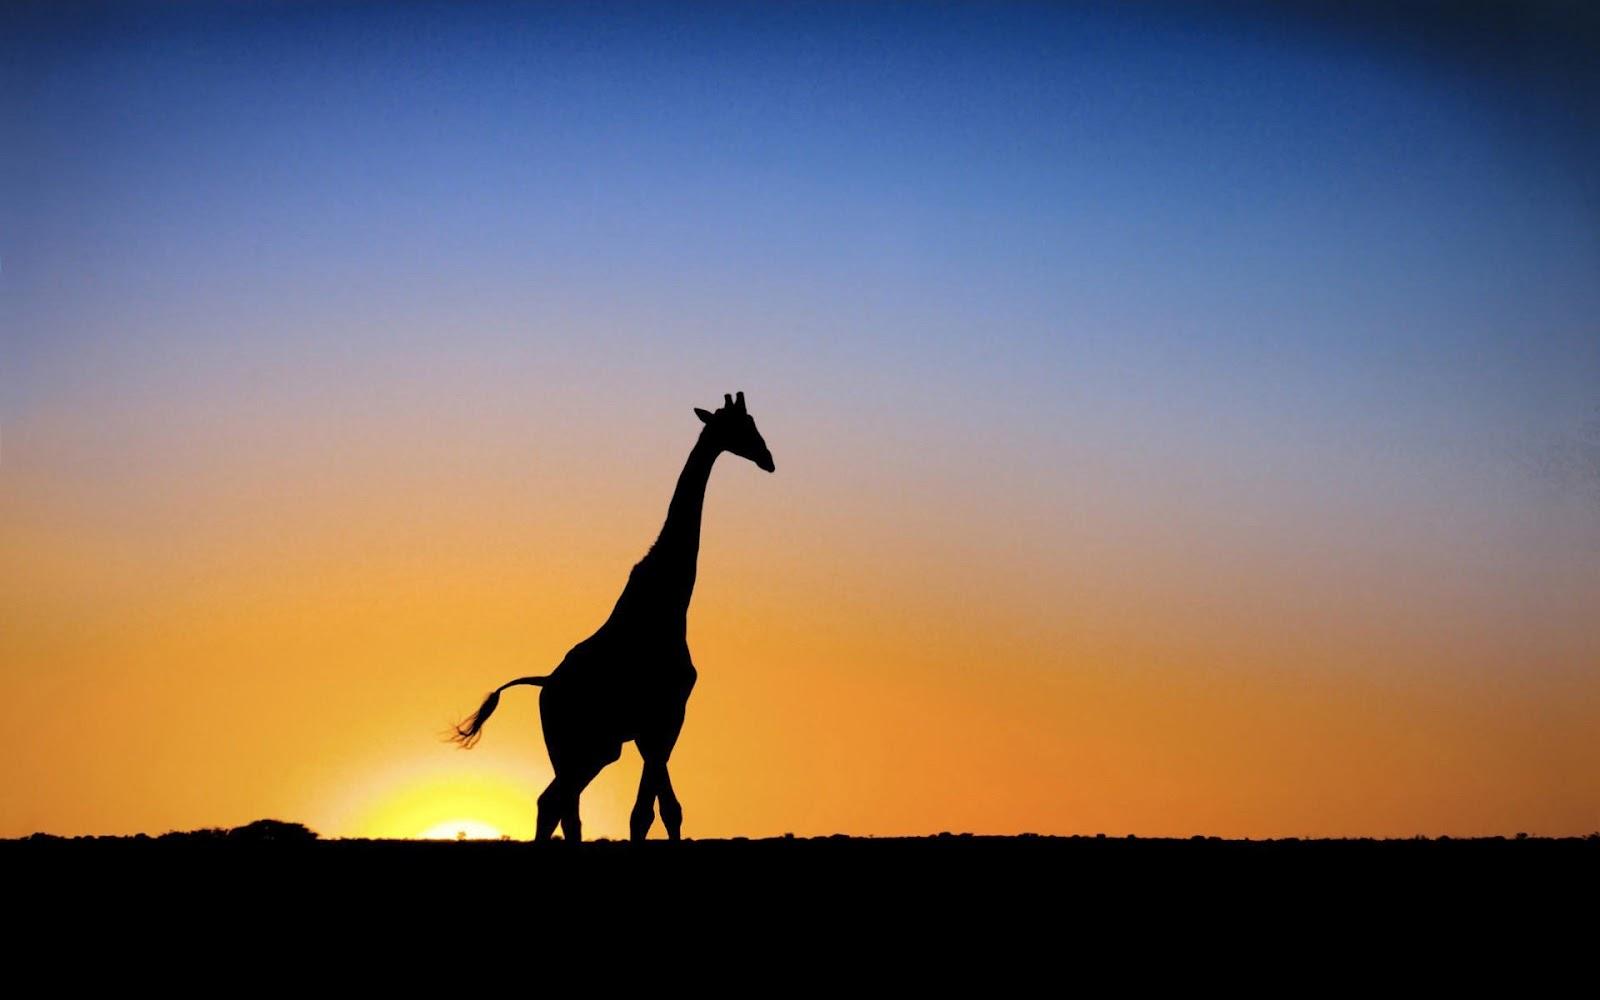 1600x1000 Giraffe Silhouette Wallpaper 50166 1600x1000 Px ~